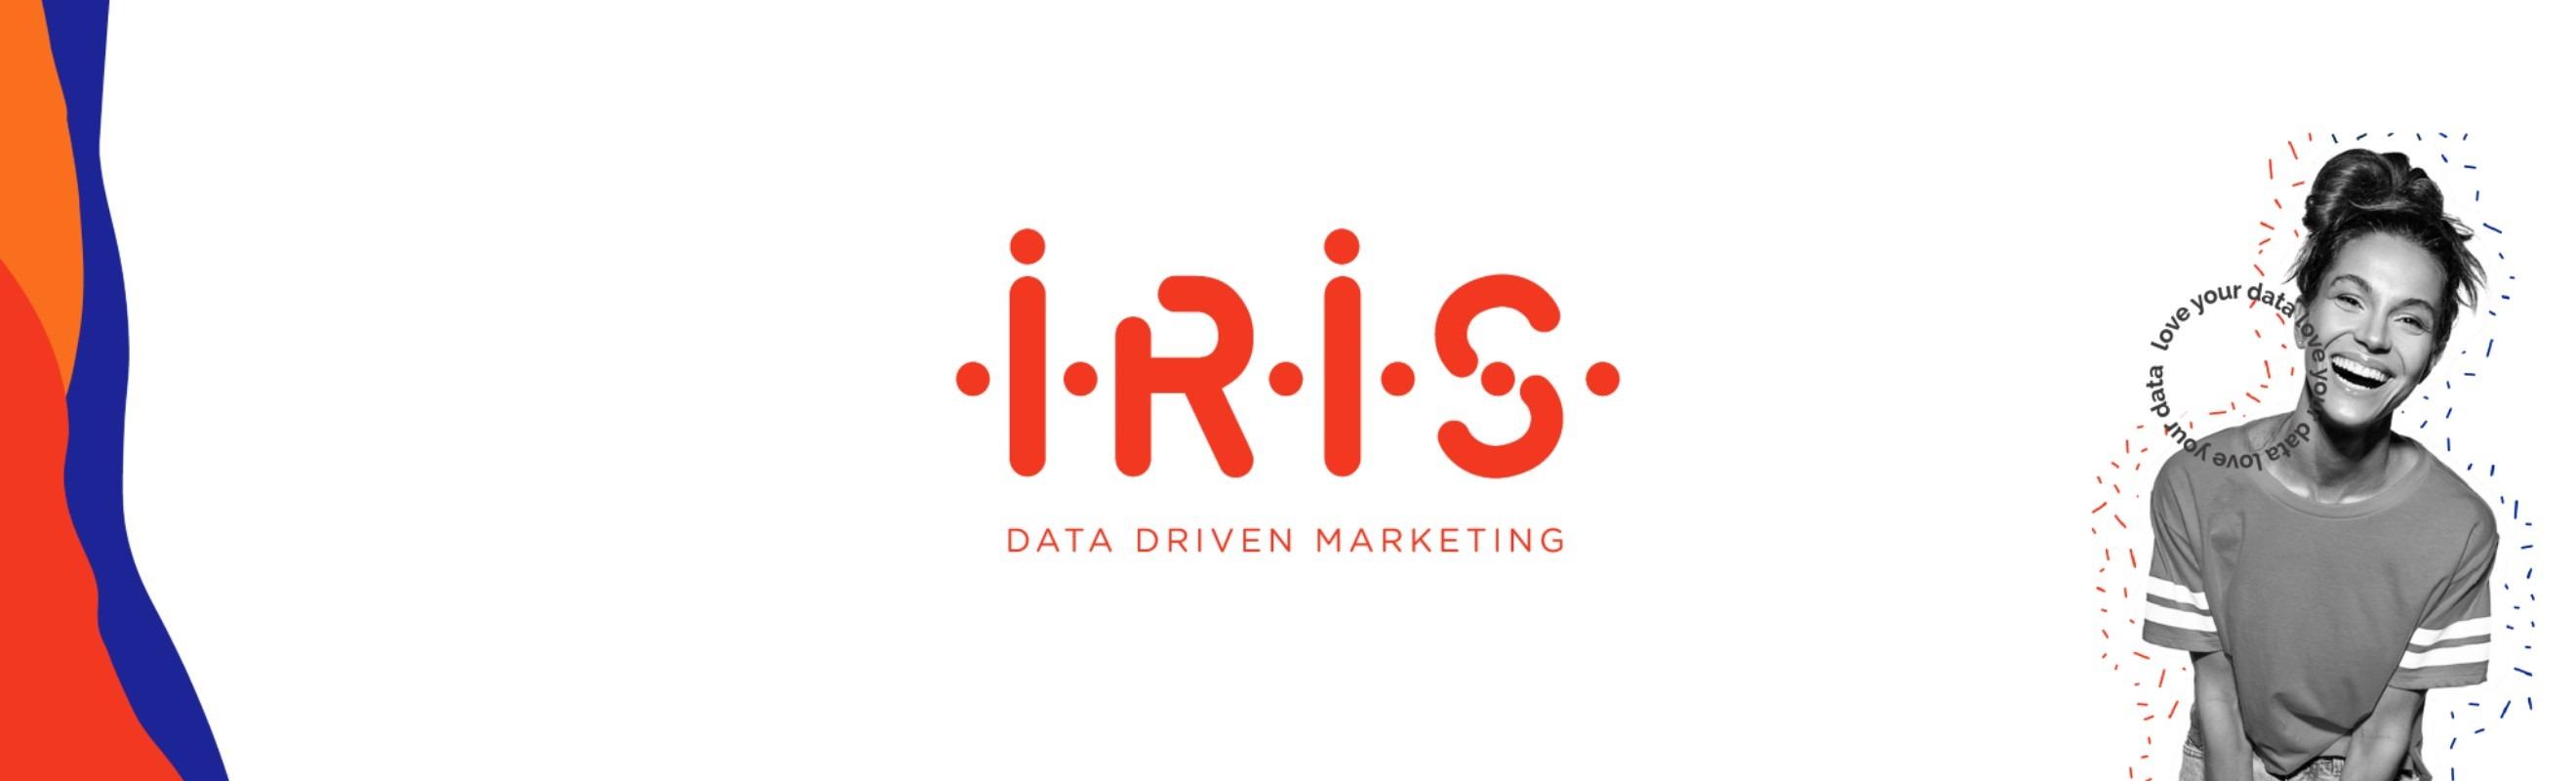 Analista de Testes [IRIS]